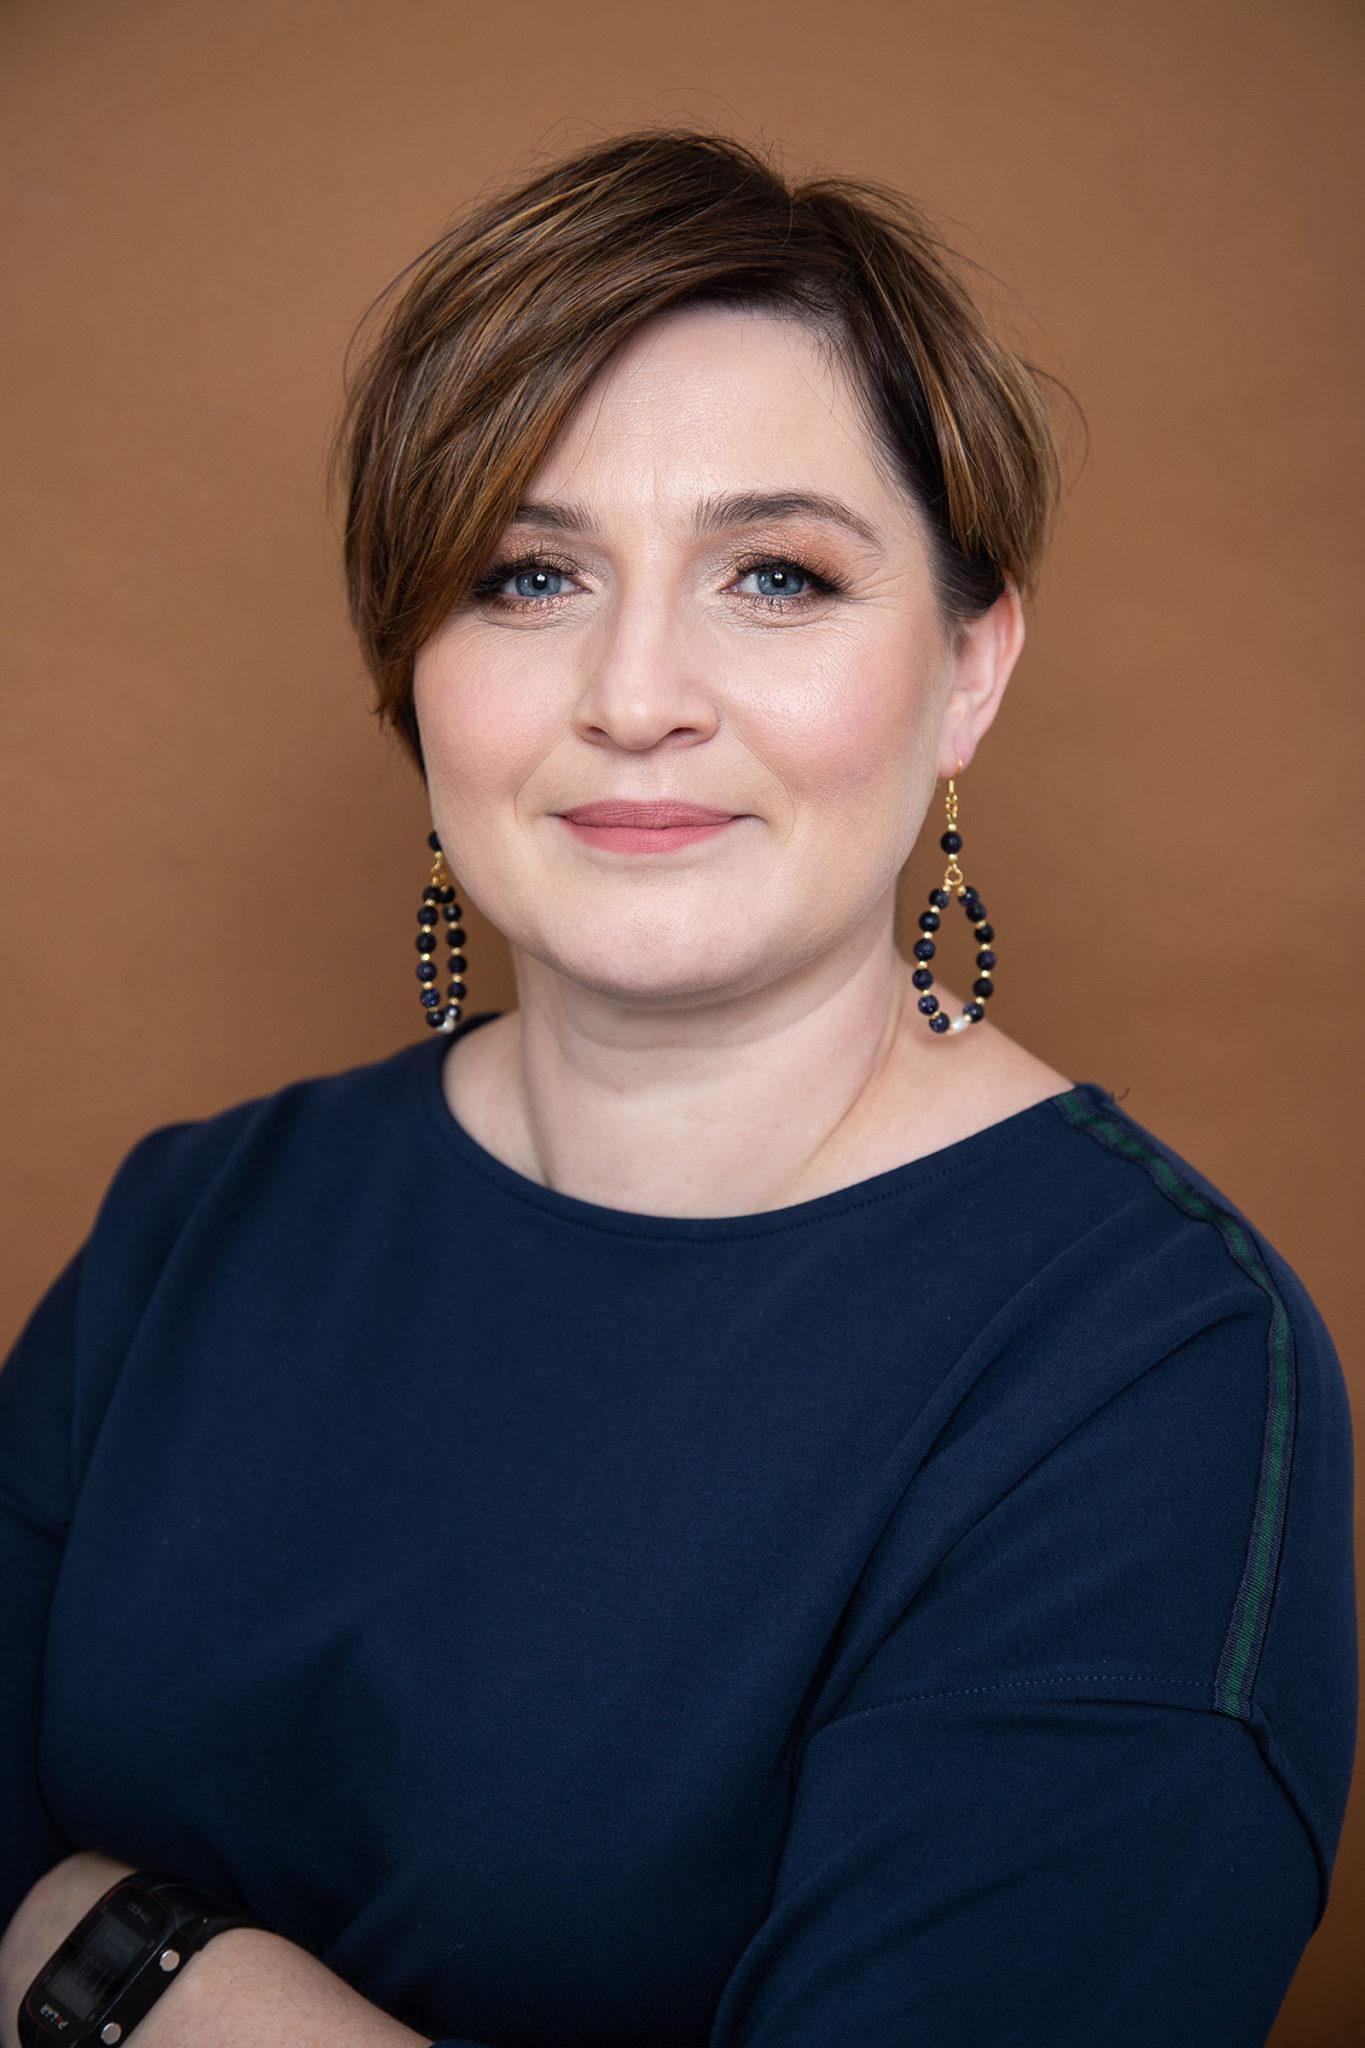 Aneta Młynarczyk 2